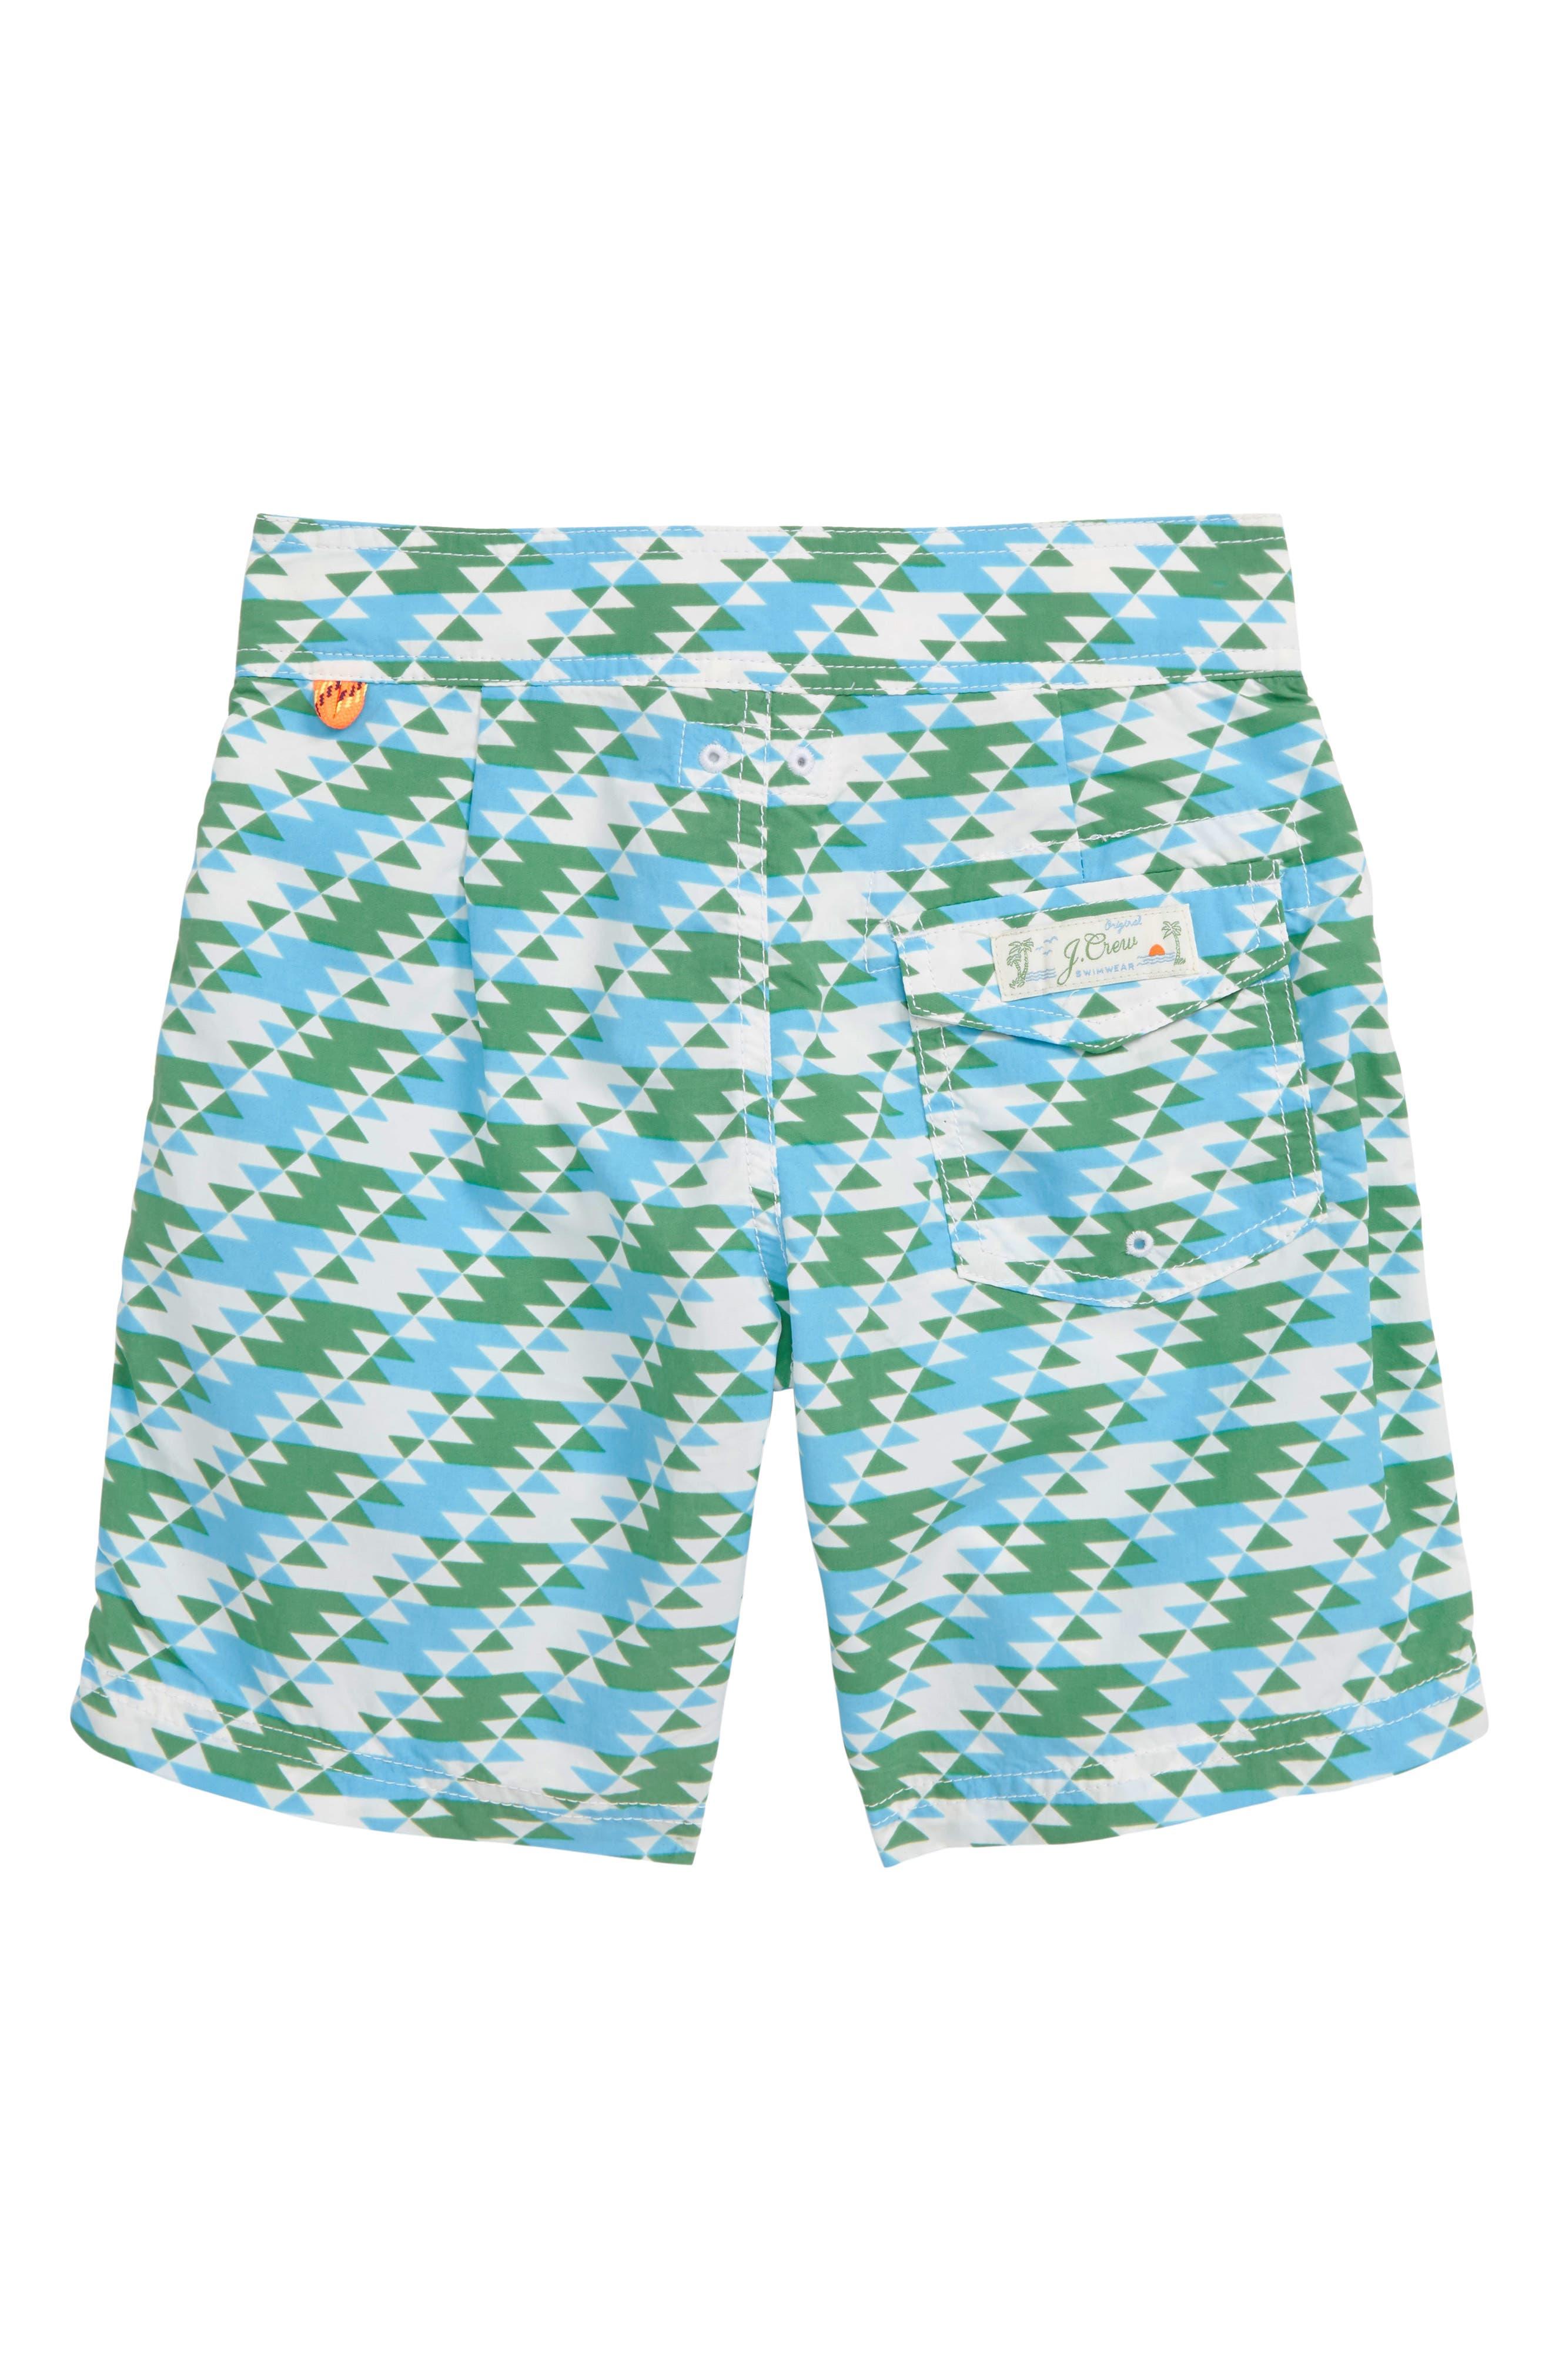 Geo Print Board Shorts,                             Alternate thumbnail 2, color,                             IVORY GREEN TEAL